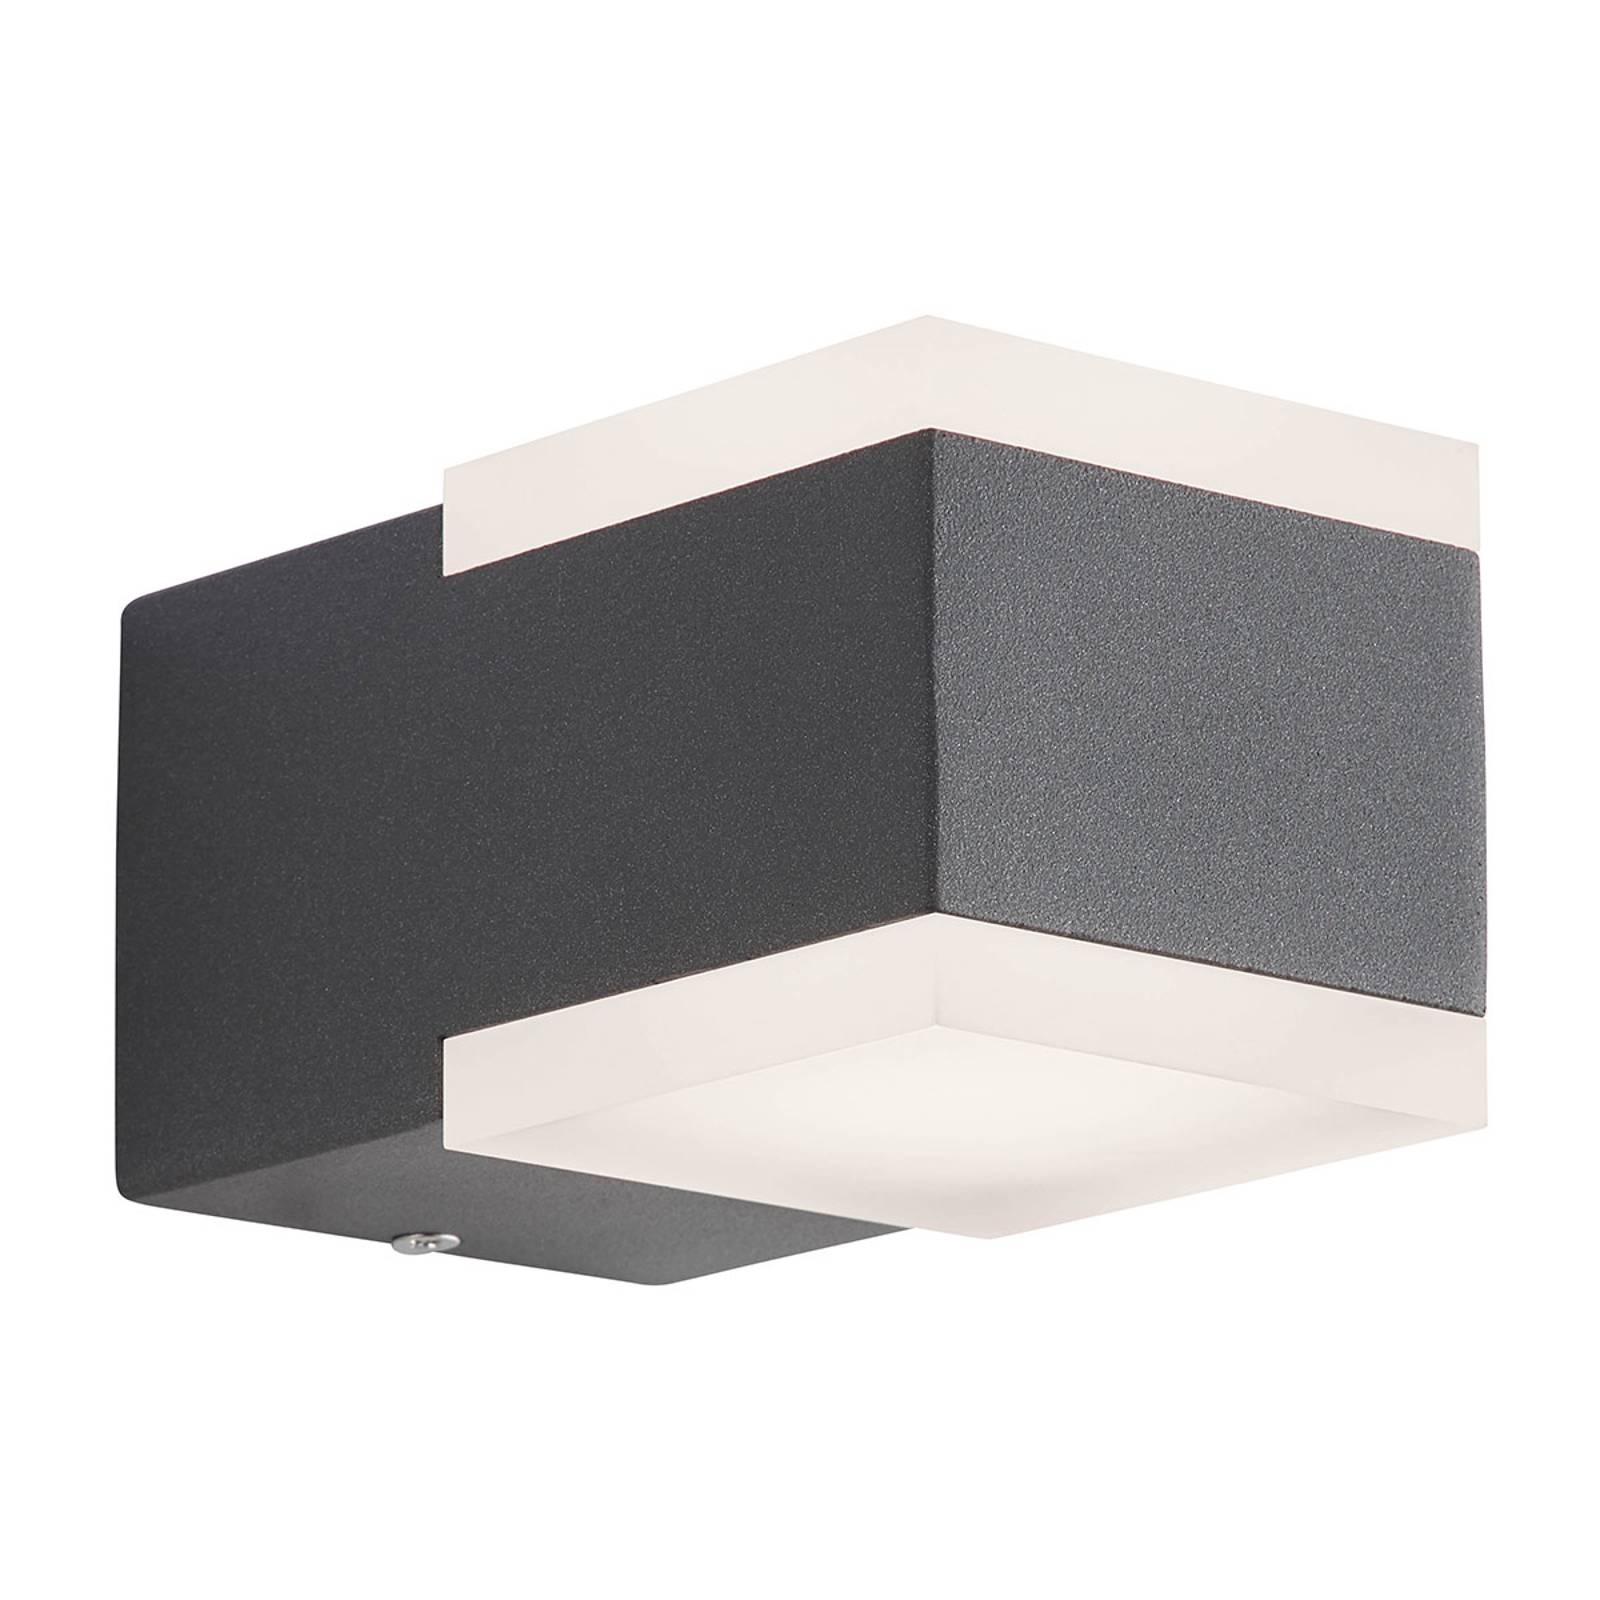 AEG Amity LED buitenwandlamp, 2-lamps